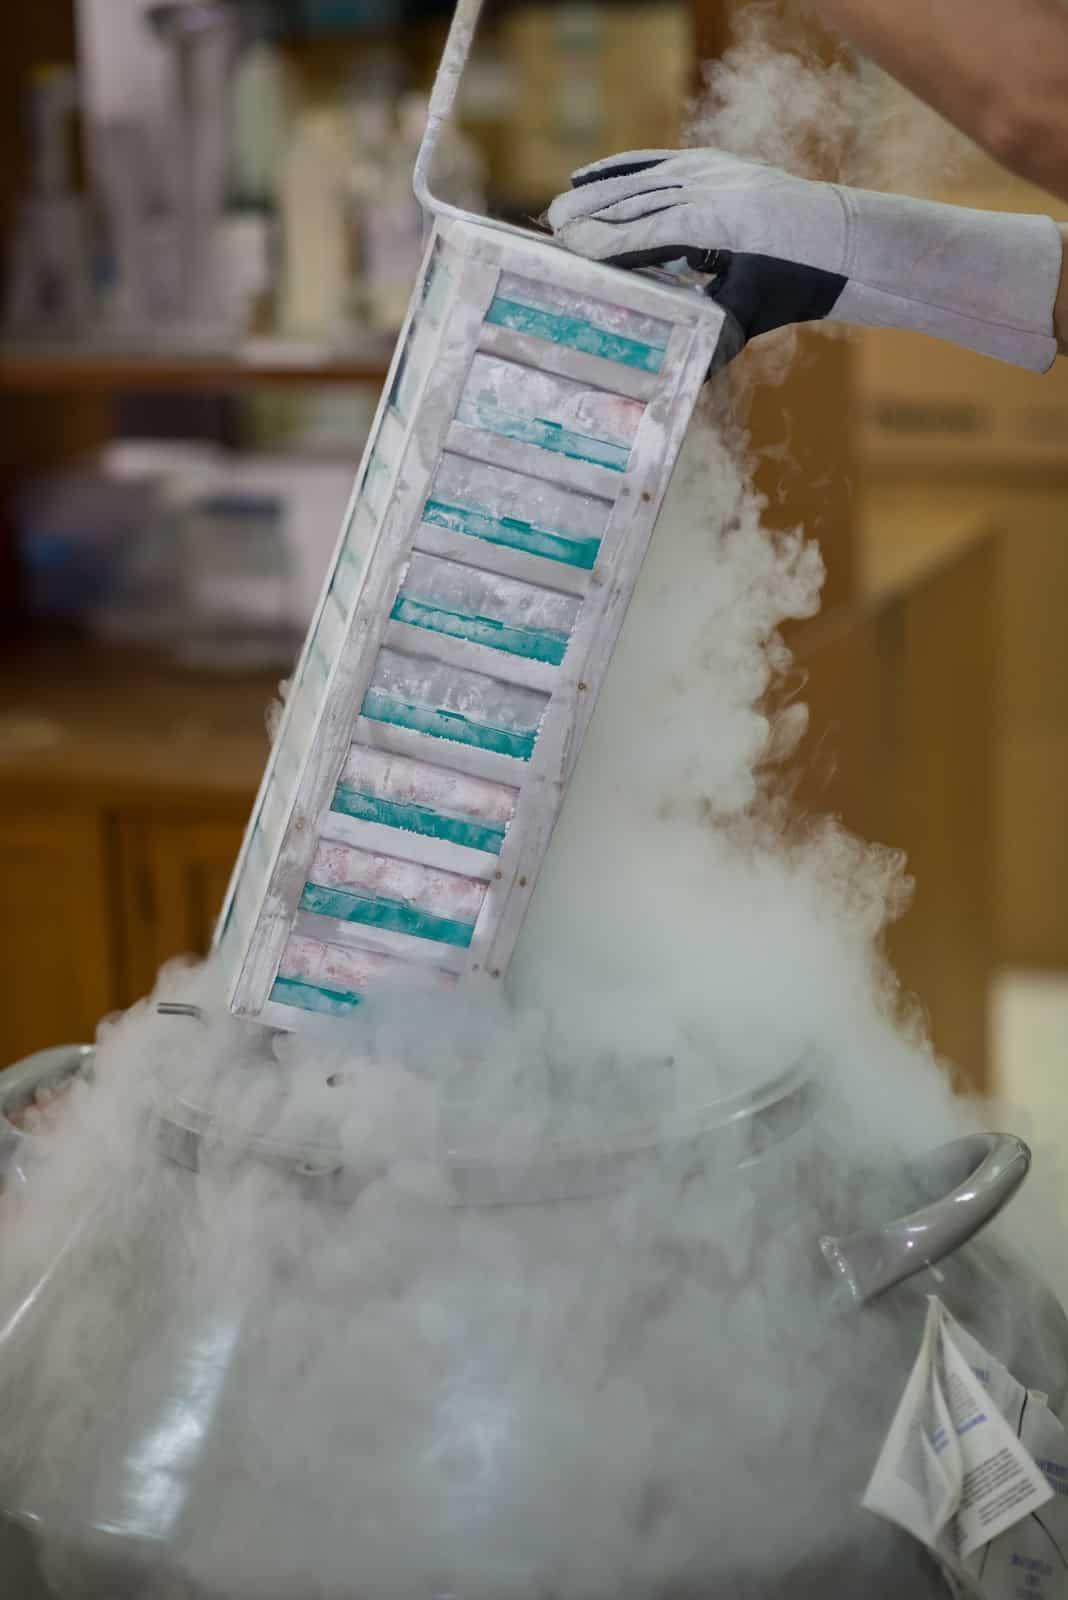 Rich Vaughn IFLG Blog: Ovary Cryopreservation